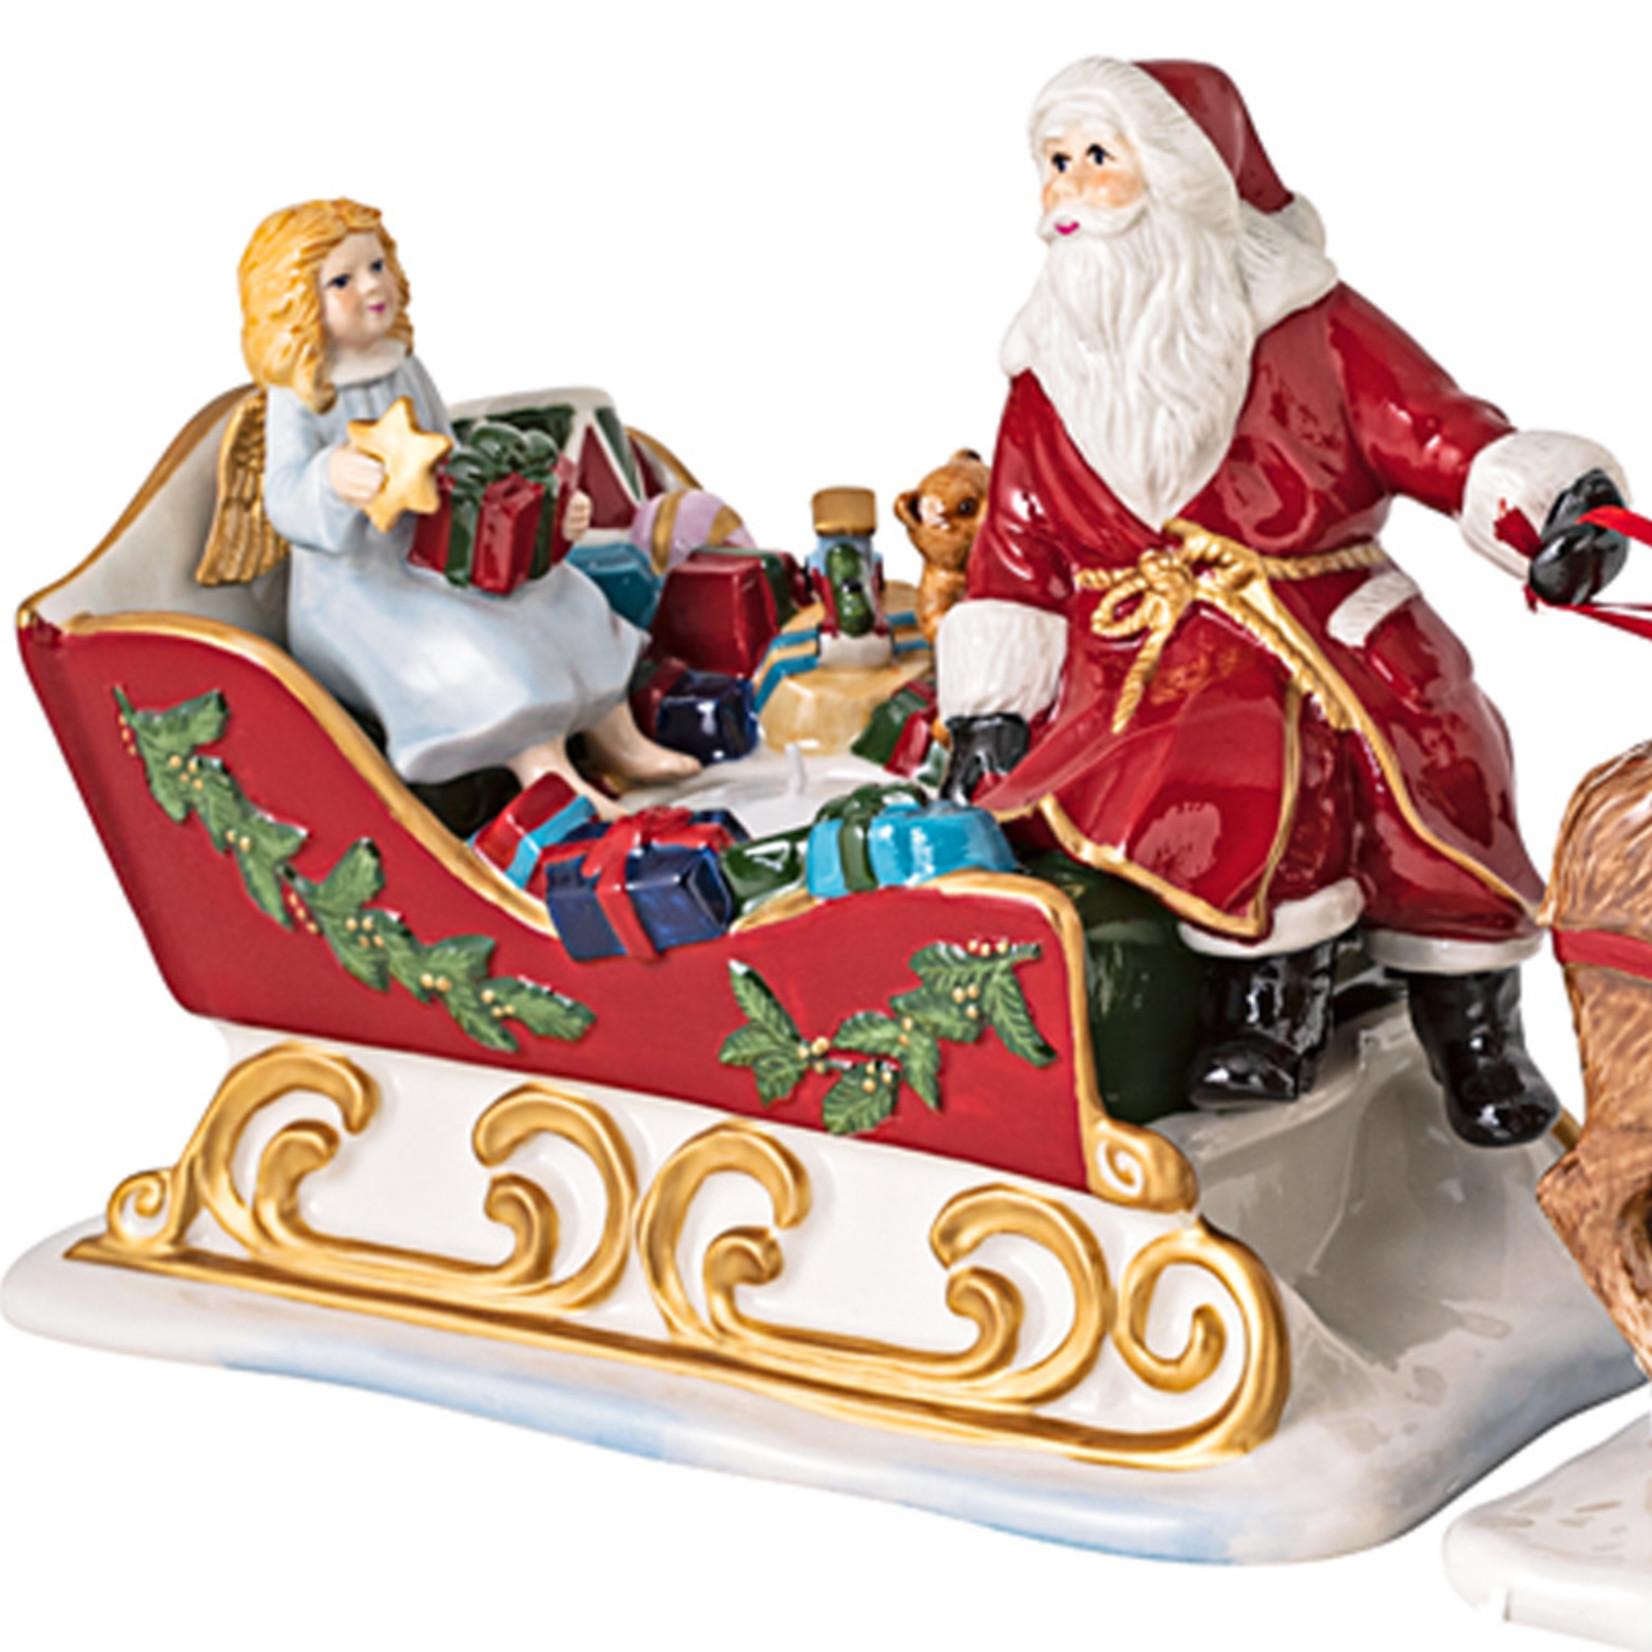 Villeroy & Boch  Schlitten mit Rentieren I Villeroy & Boch I Christmas Toys Nostalgie